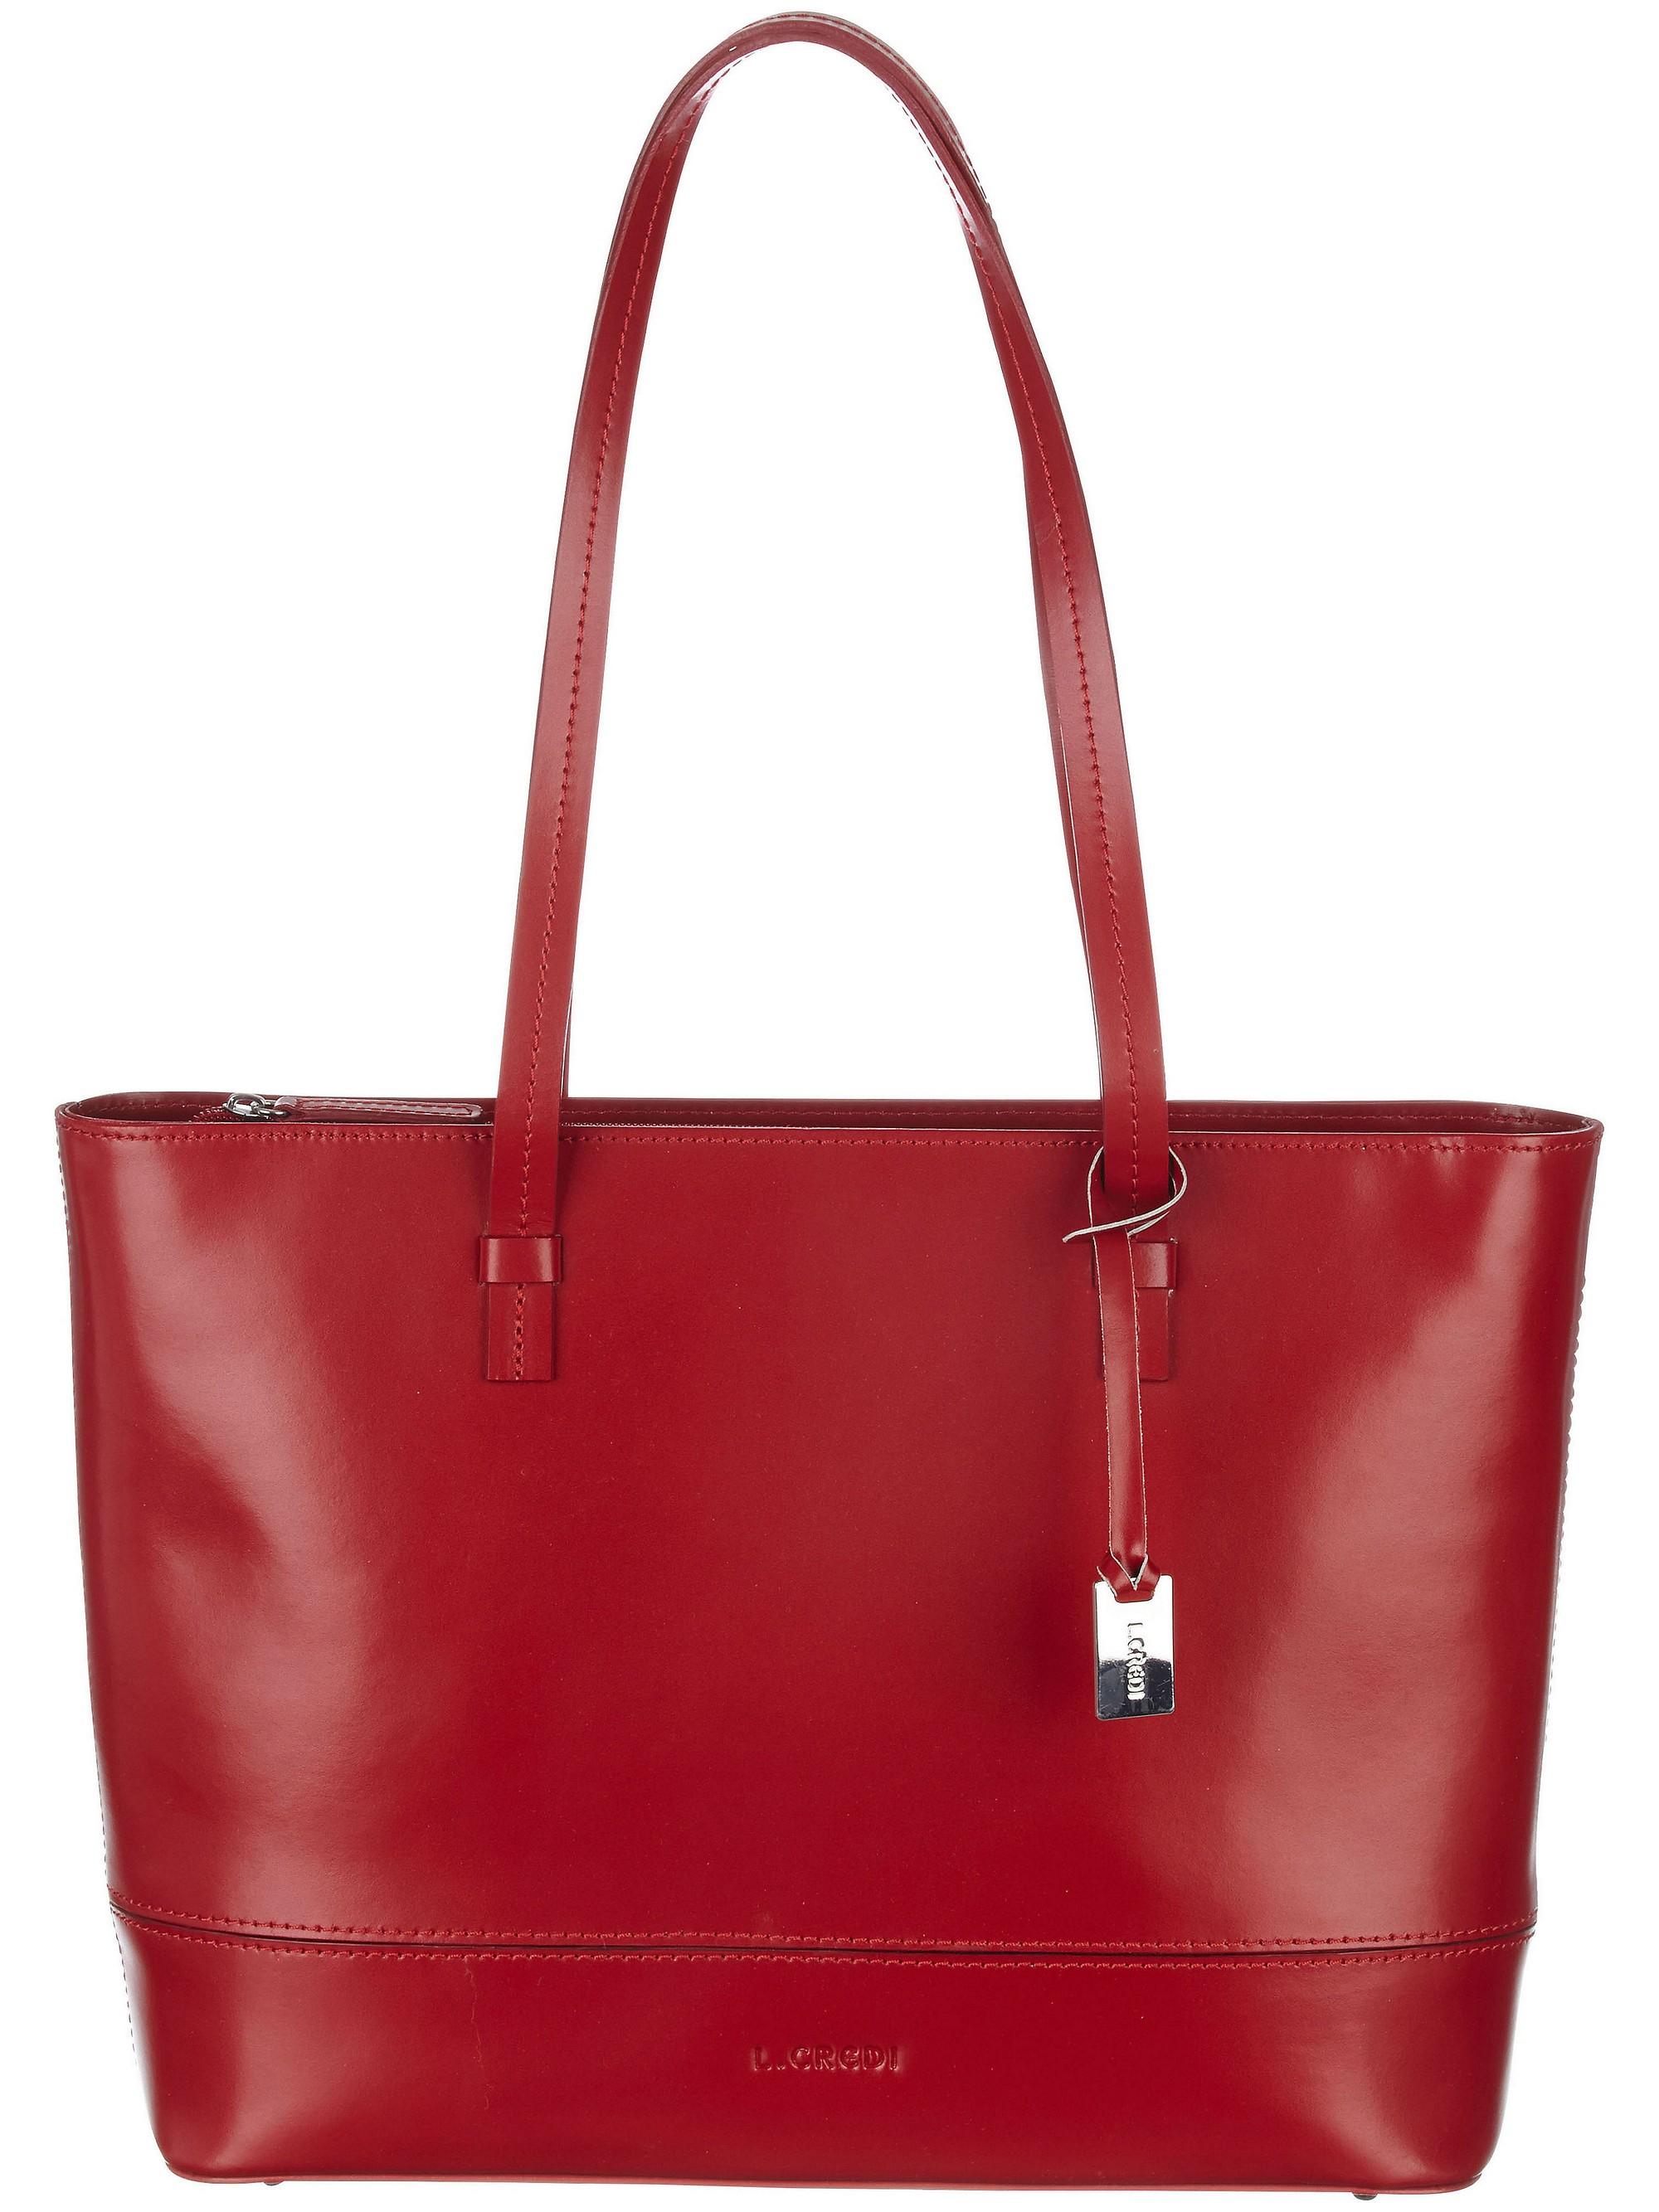 l-credi-le-sac-en-cuir-rouge-374991_PACK_F_160414_110756